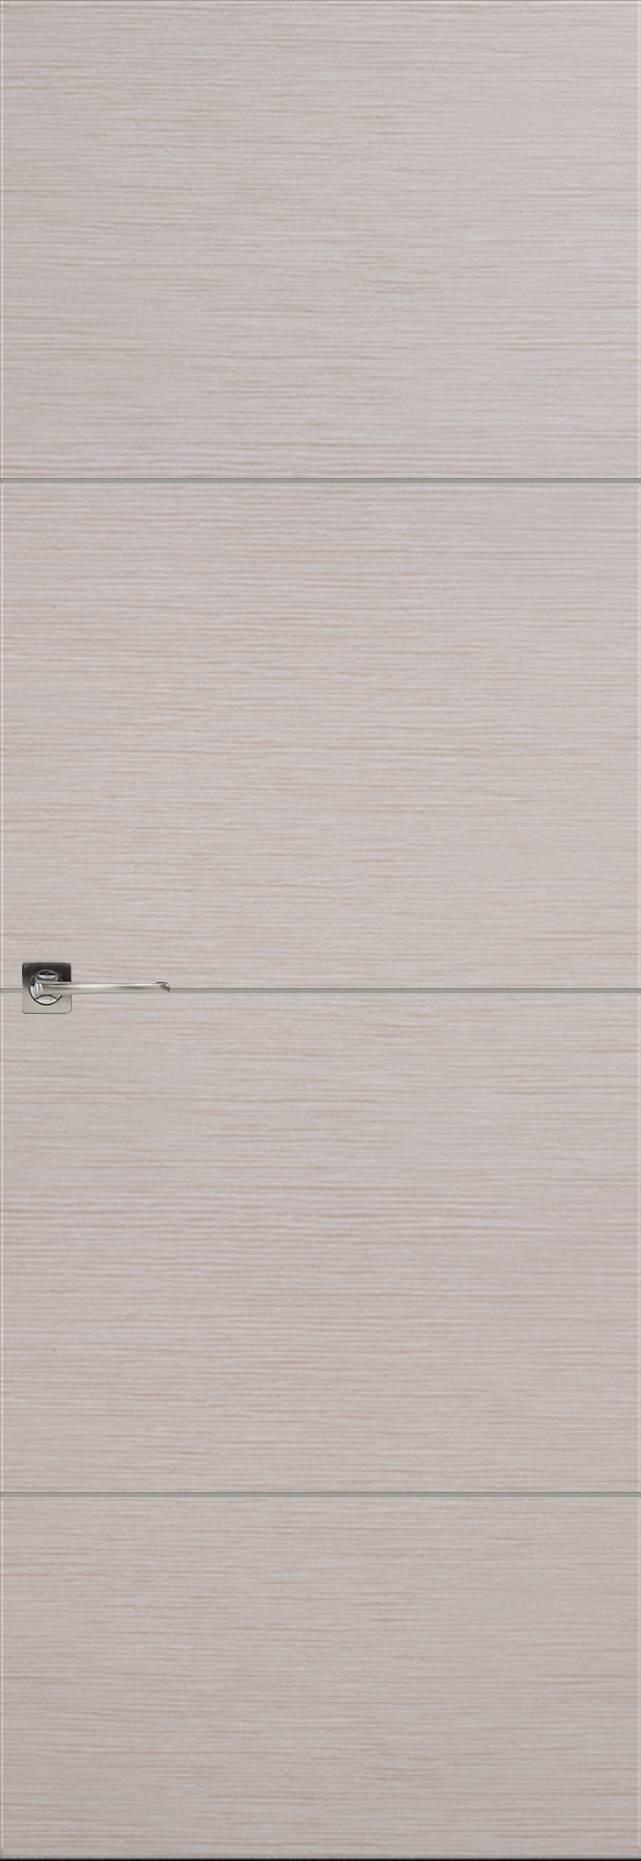 Tivoli Г-2 Invisible цвет - Дымчатый дуб Без стекла (ДГ)